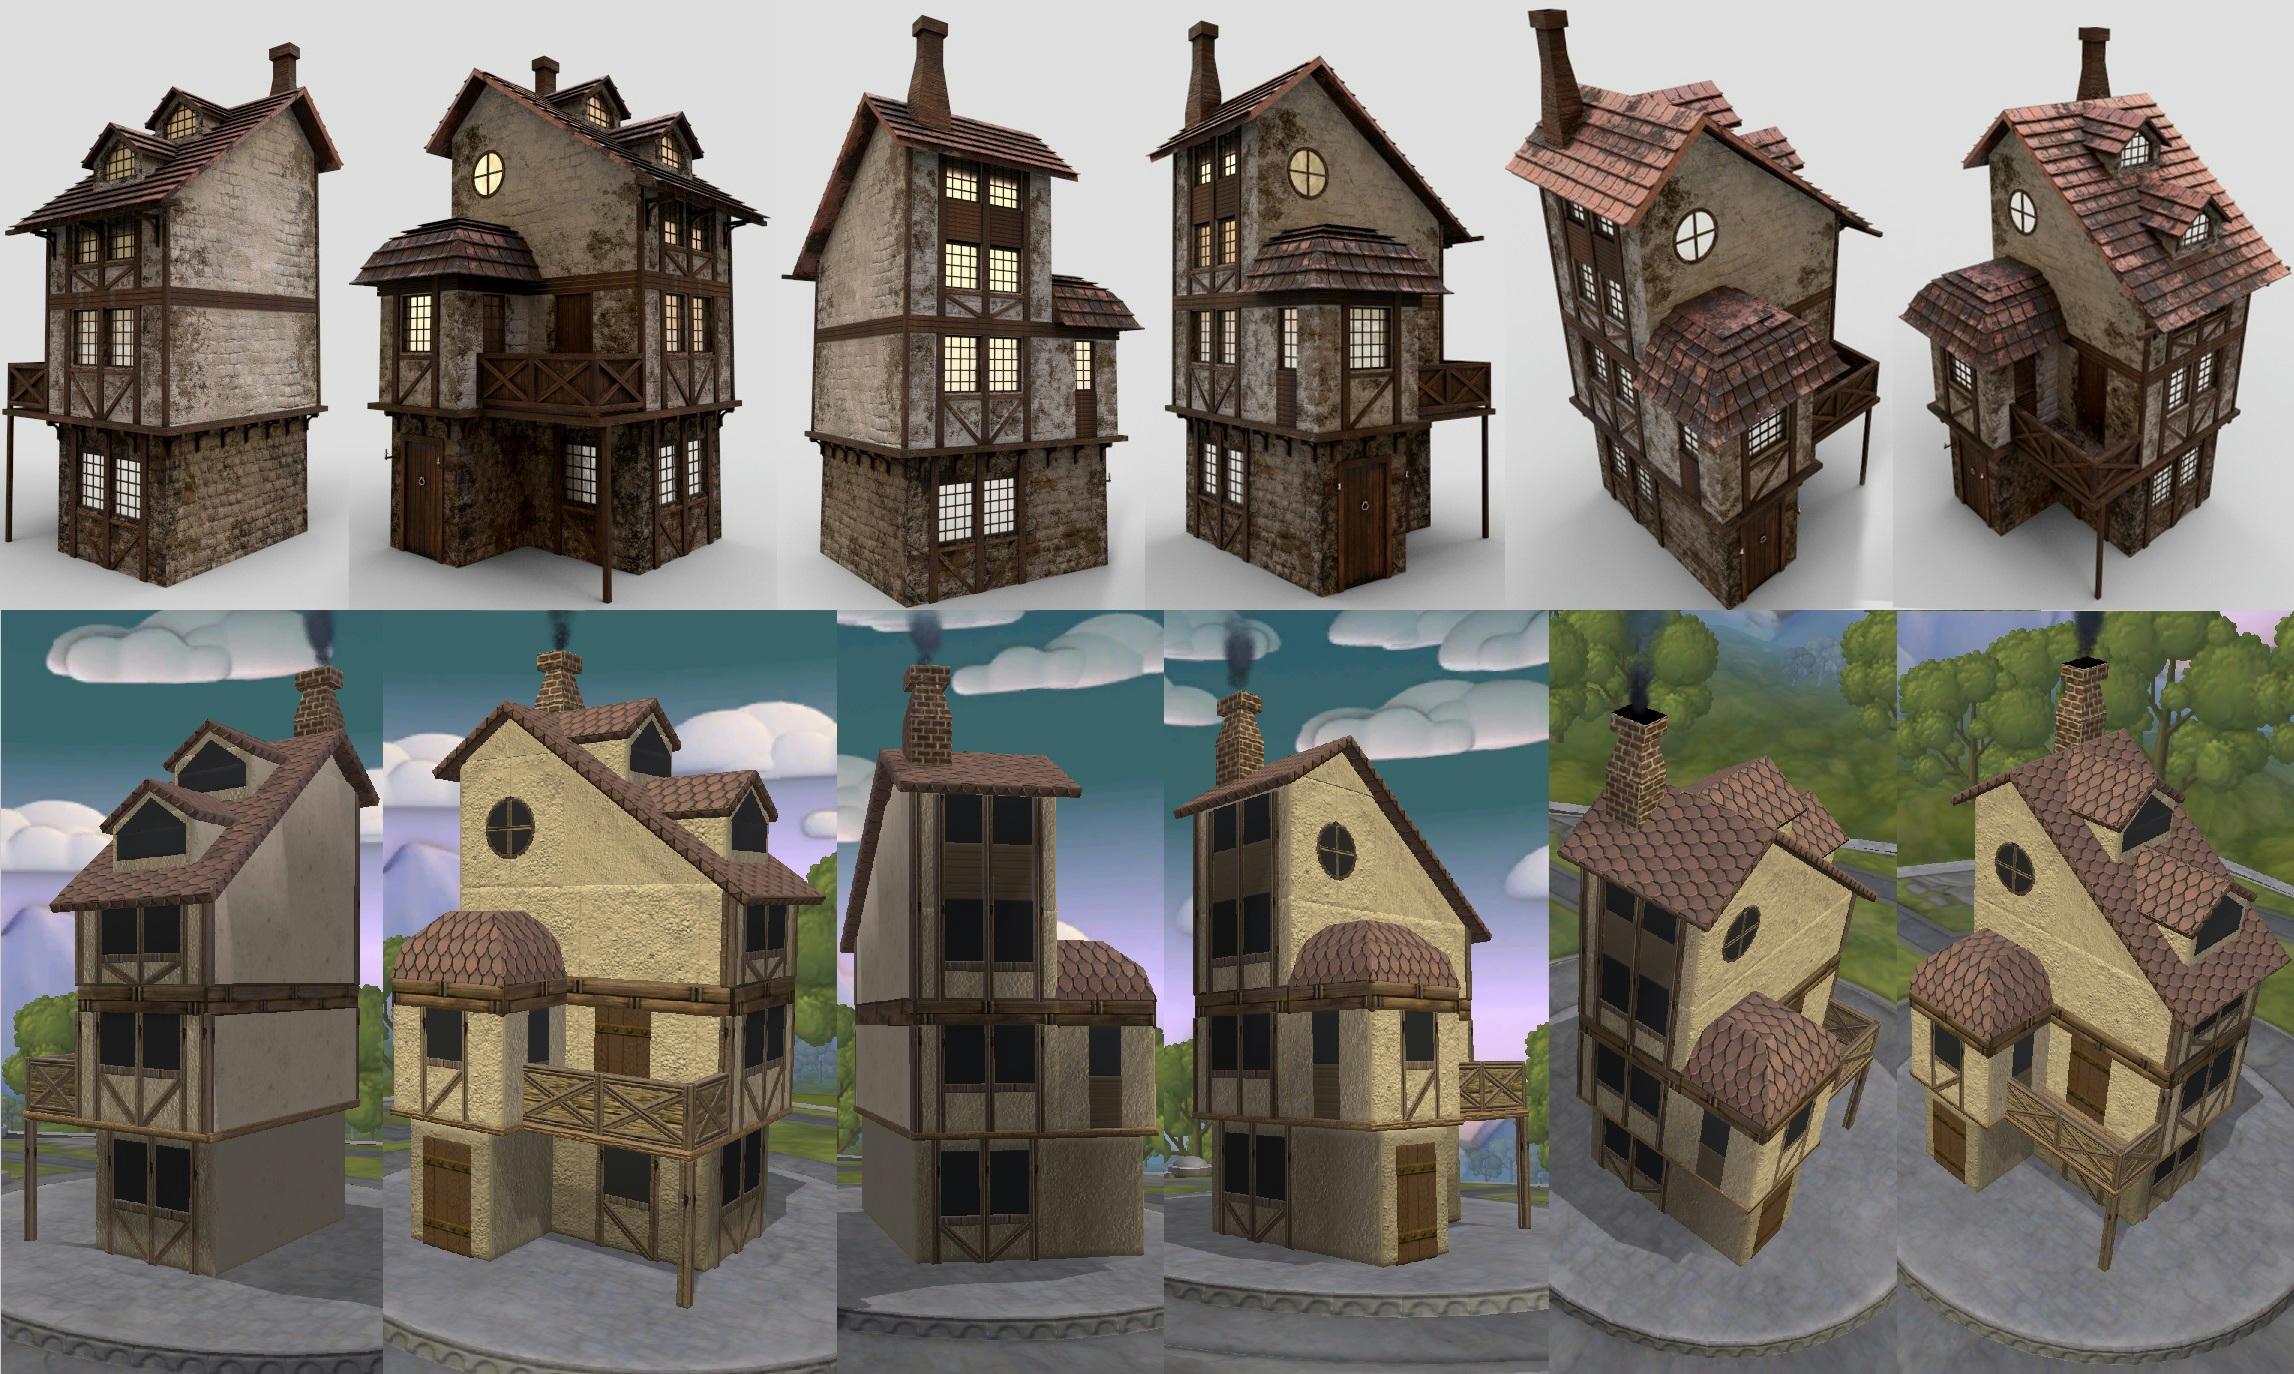 Casa Medieval. Ouljjyqahnn8fp6zg